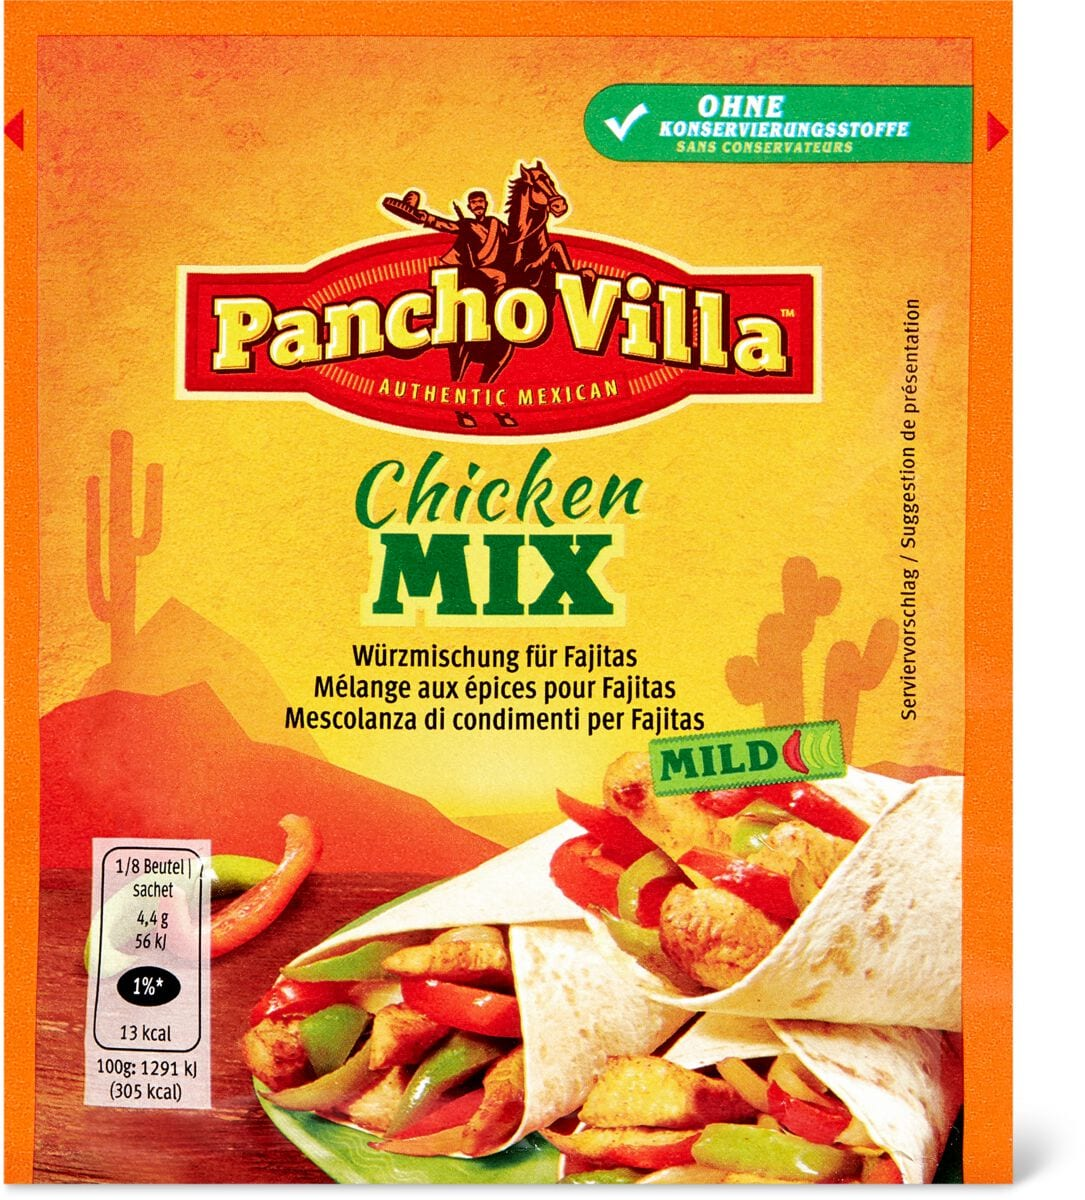 Pancho Villa Chicken Mix